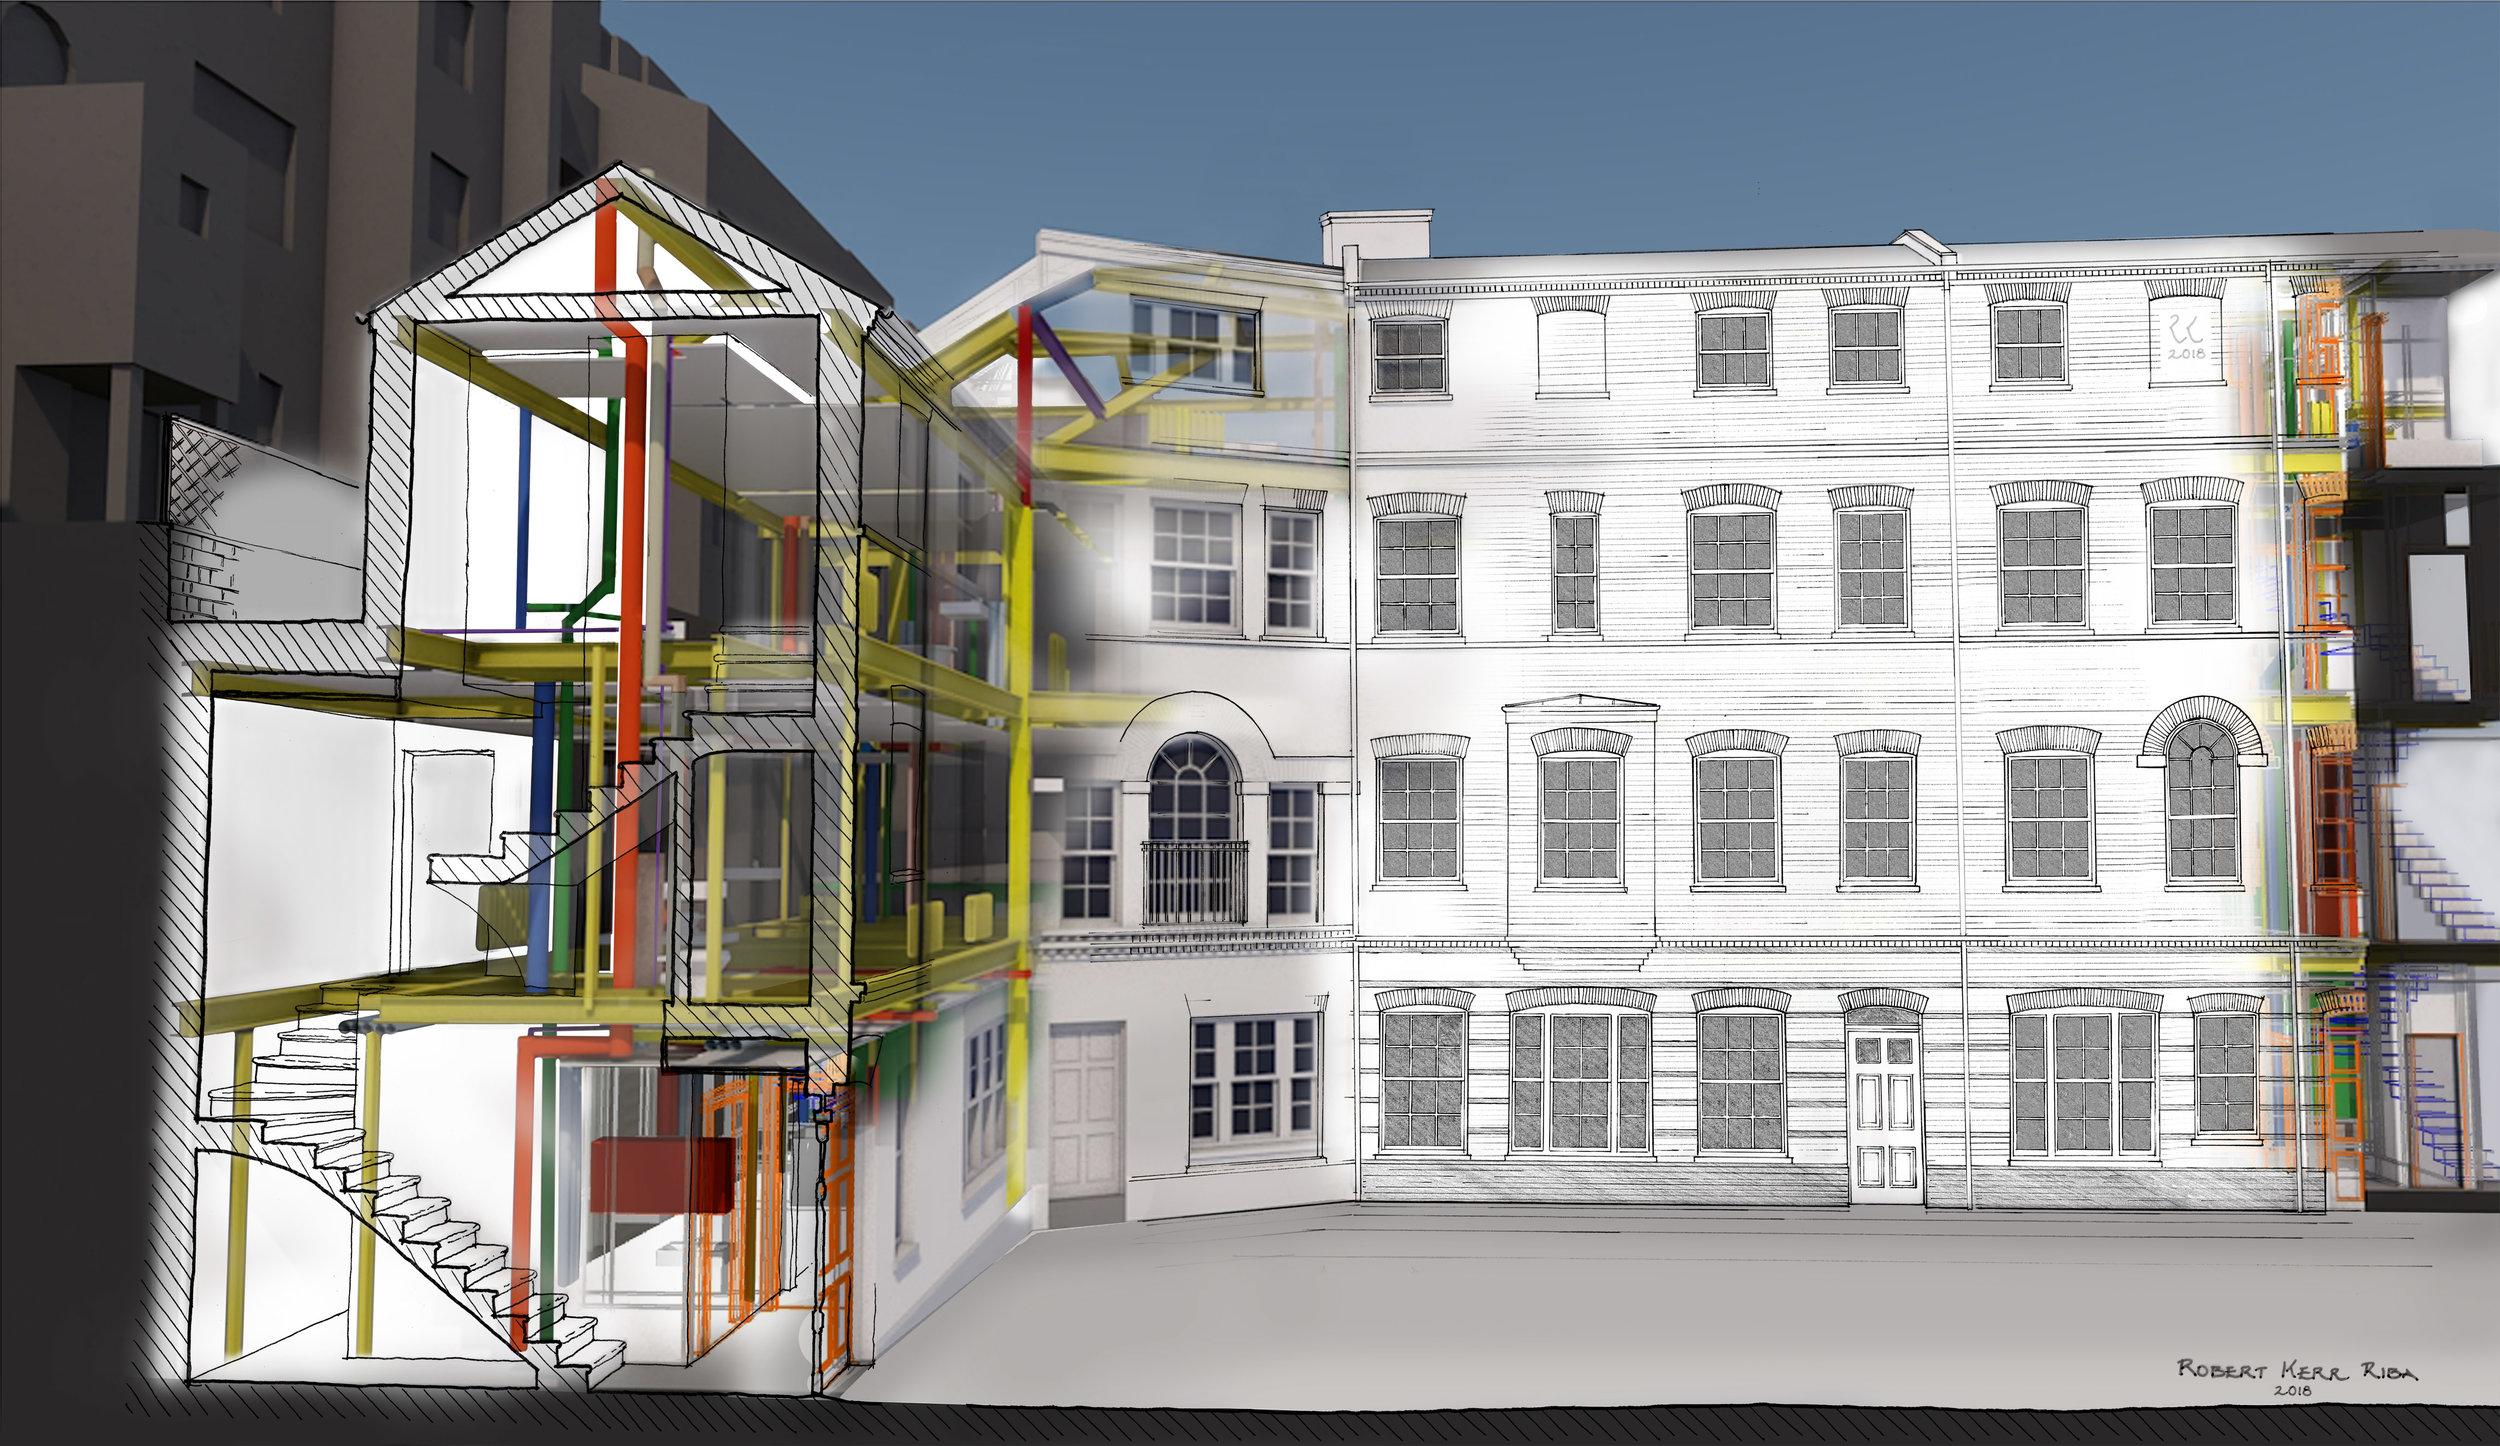 Robert Kerr_Traditional modern building-81x49.5x2cm.jpg